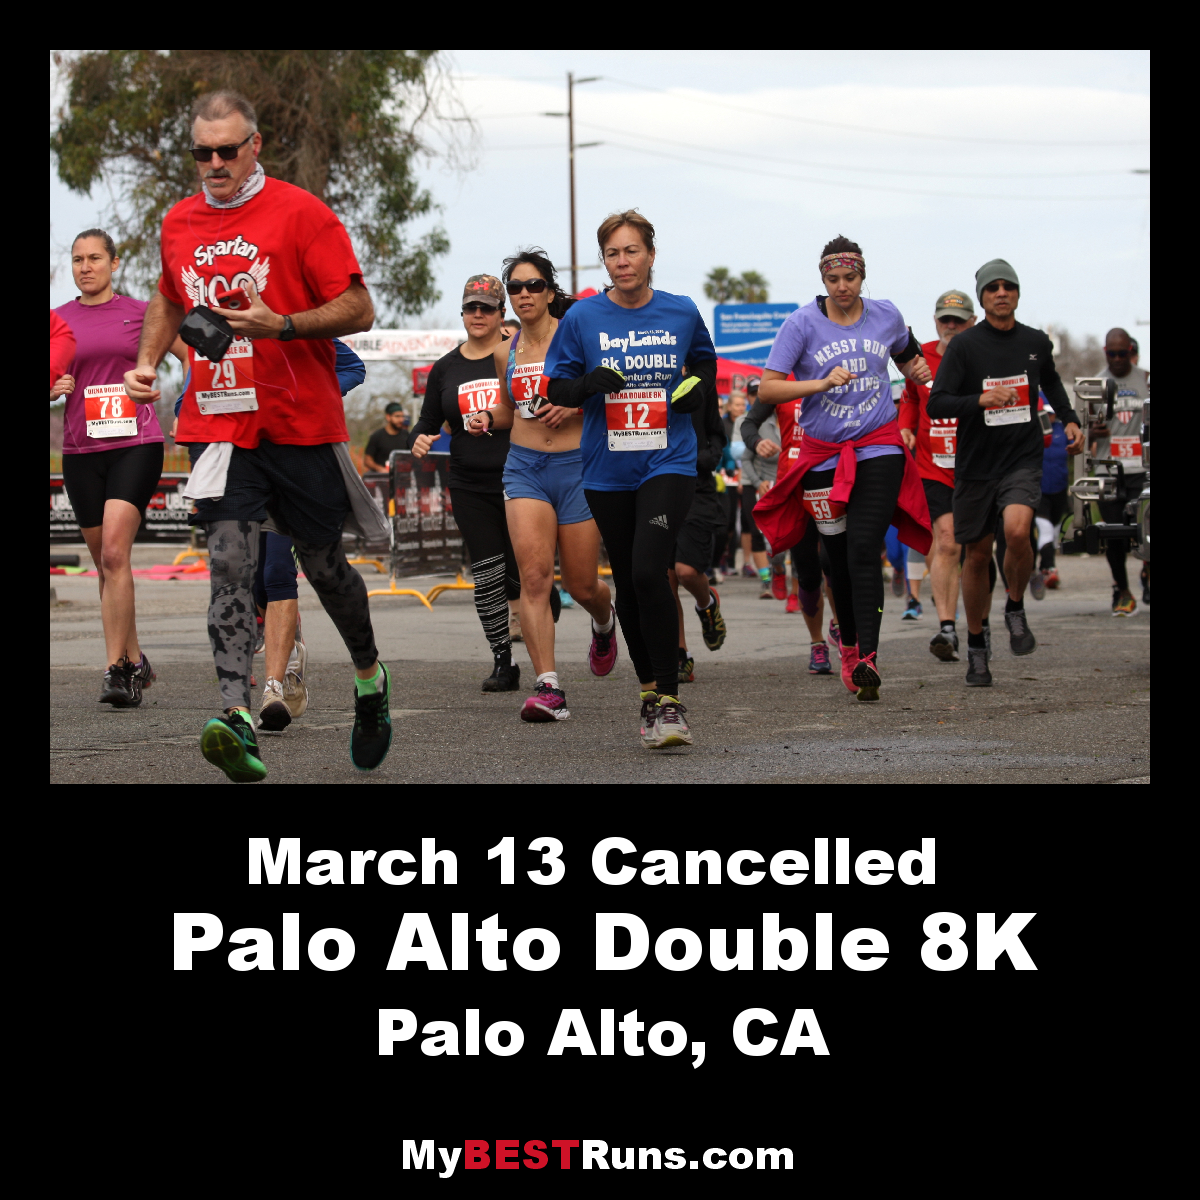 Palo Alto Double 8K & 10K/5K